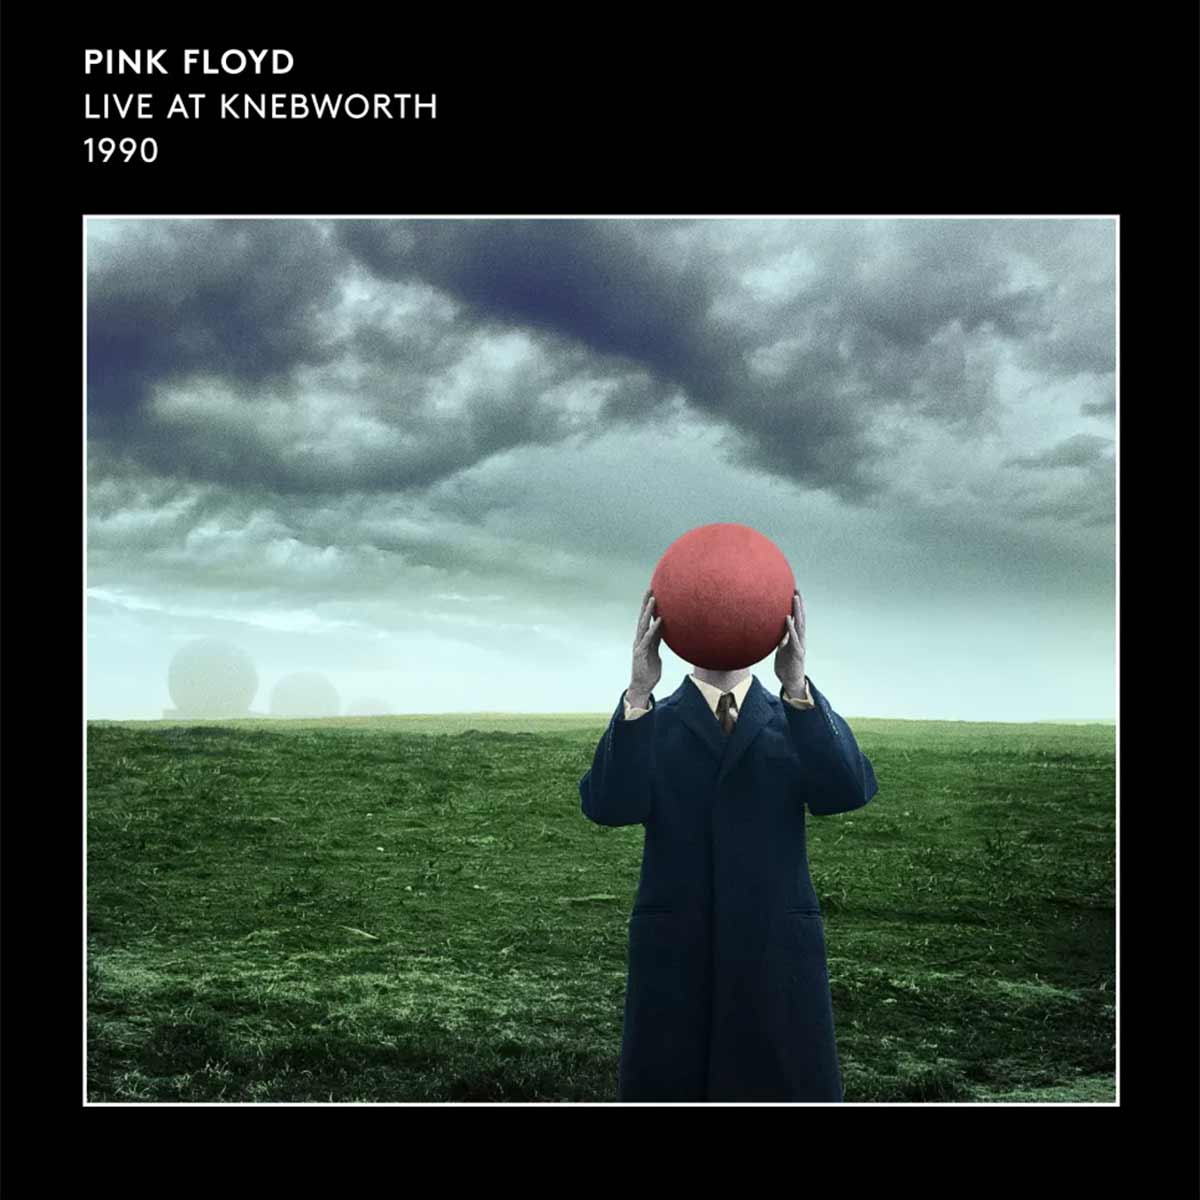 Live at Knebworth album cover